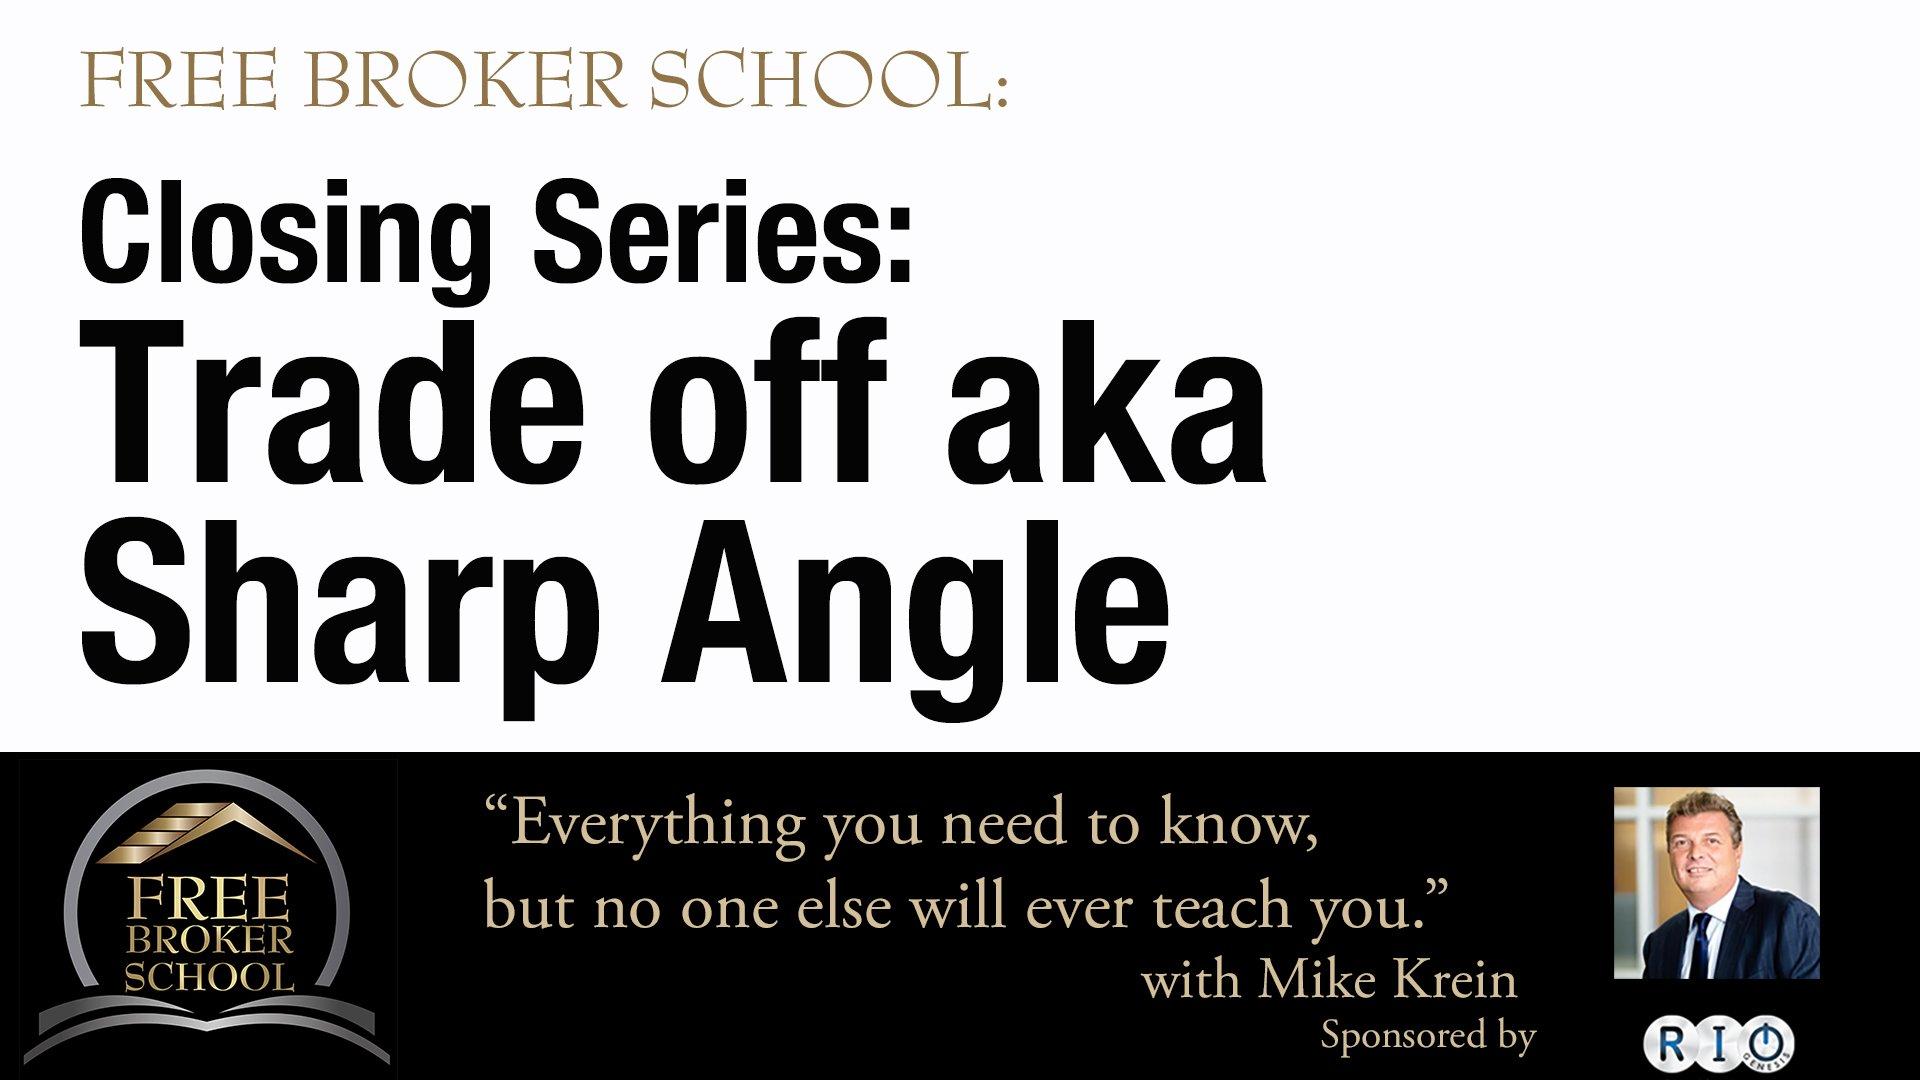 Free Broker School: Closing Series: Trade off aka Sharp Angle